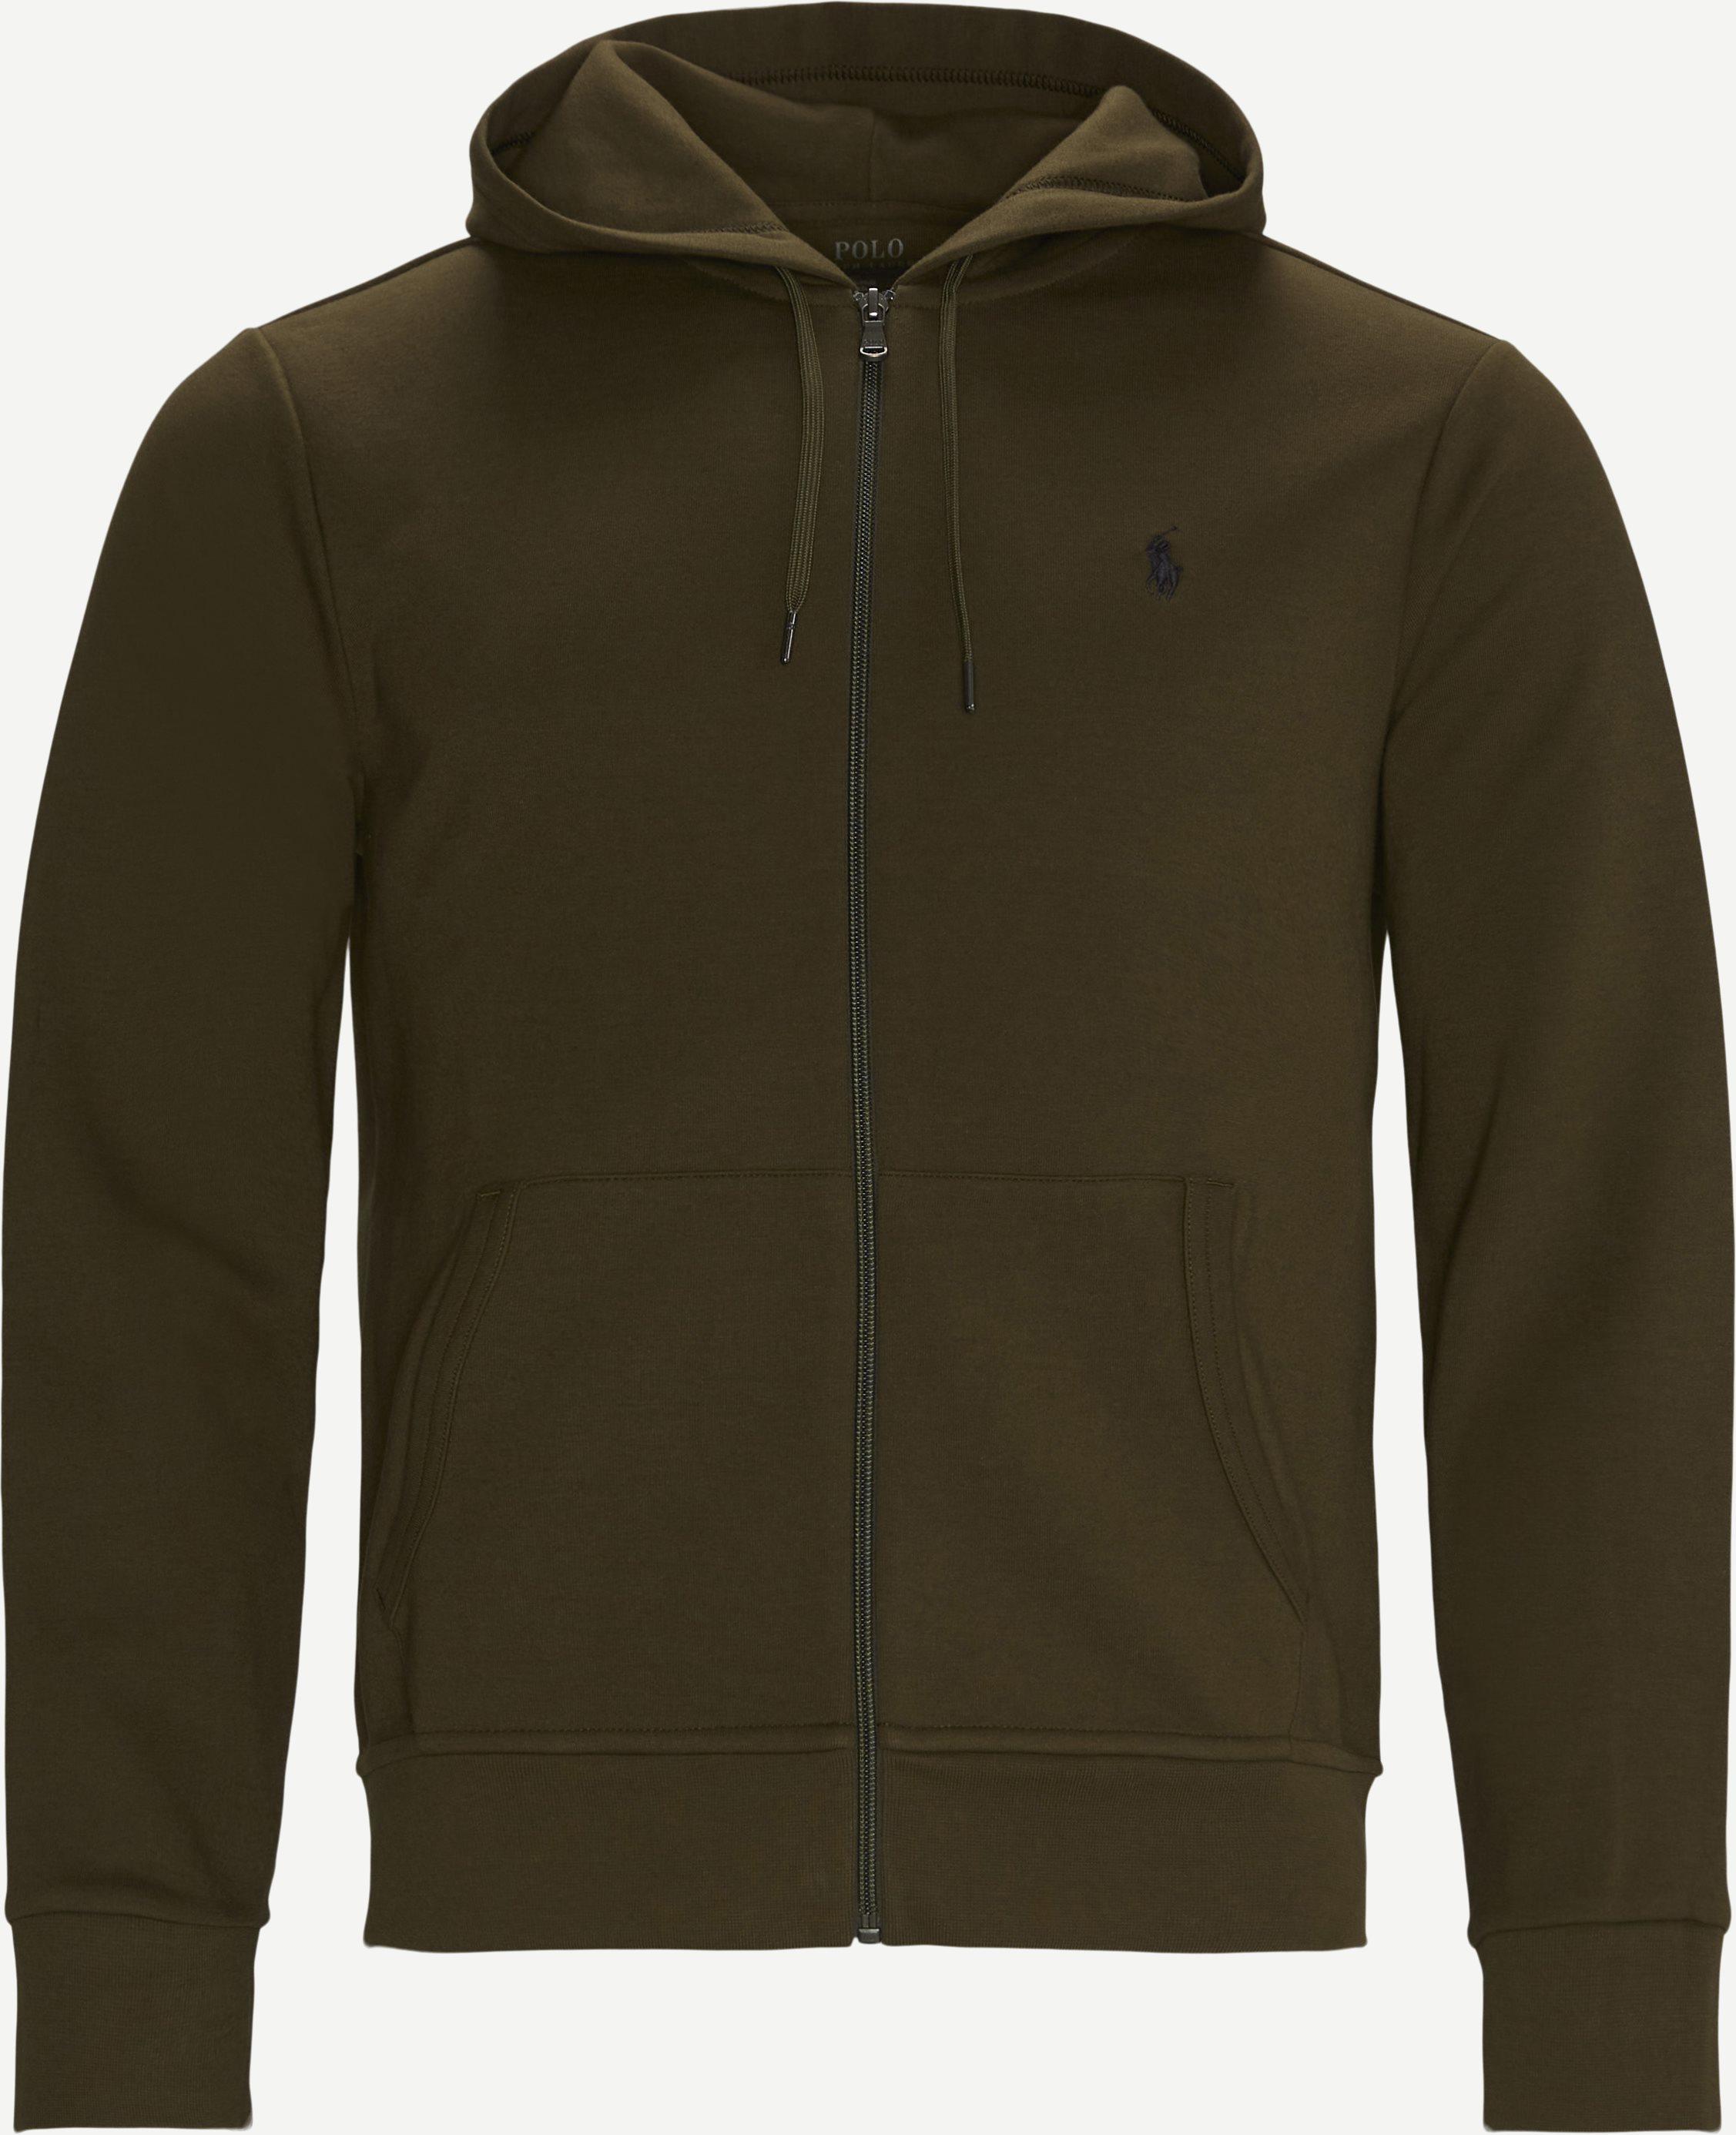 Sweatshirts - Regular fit - Oliv